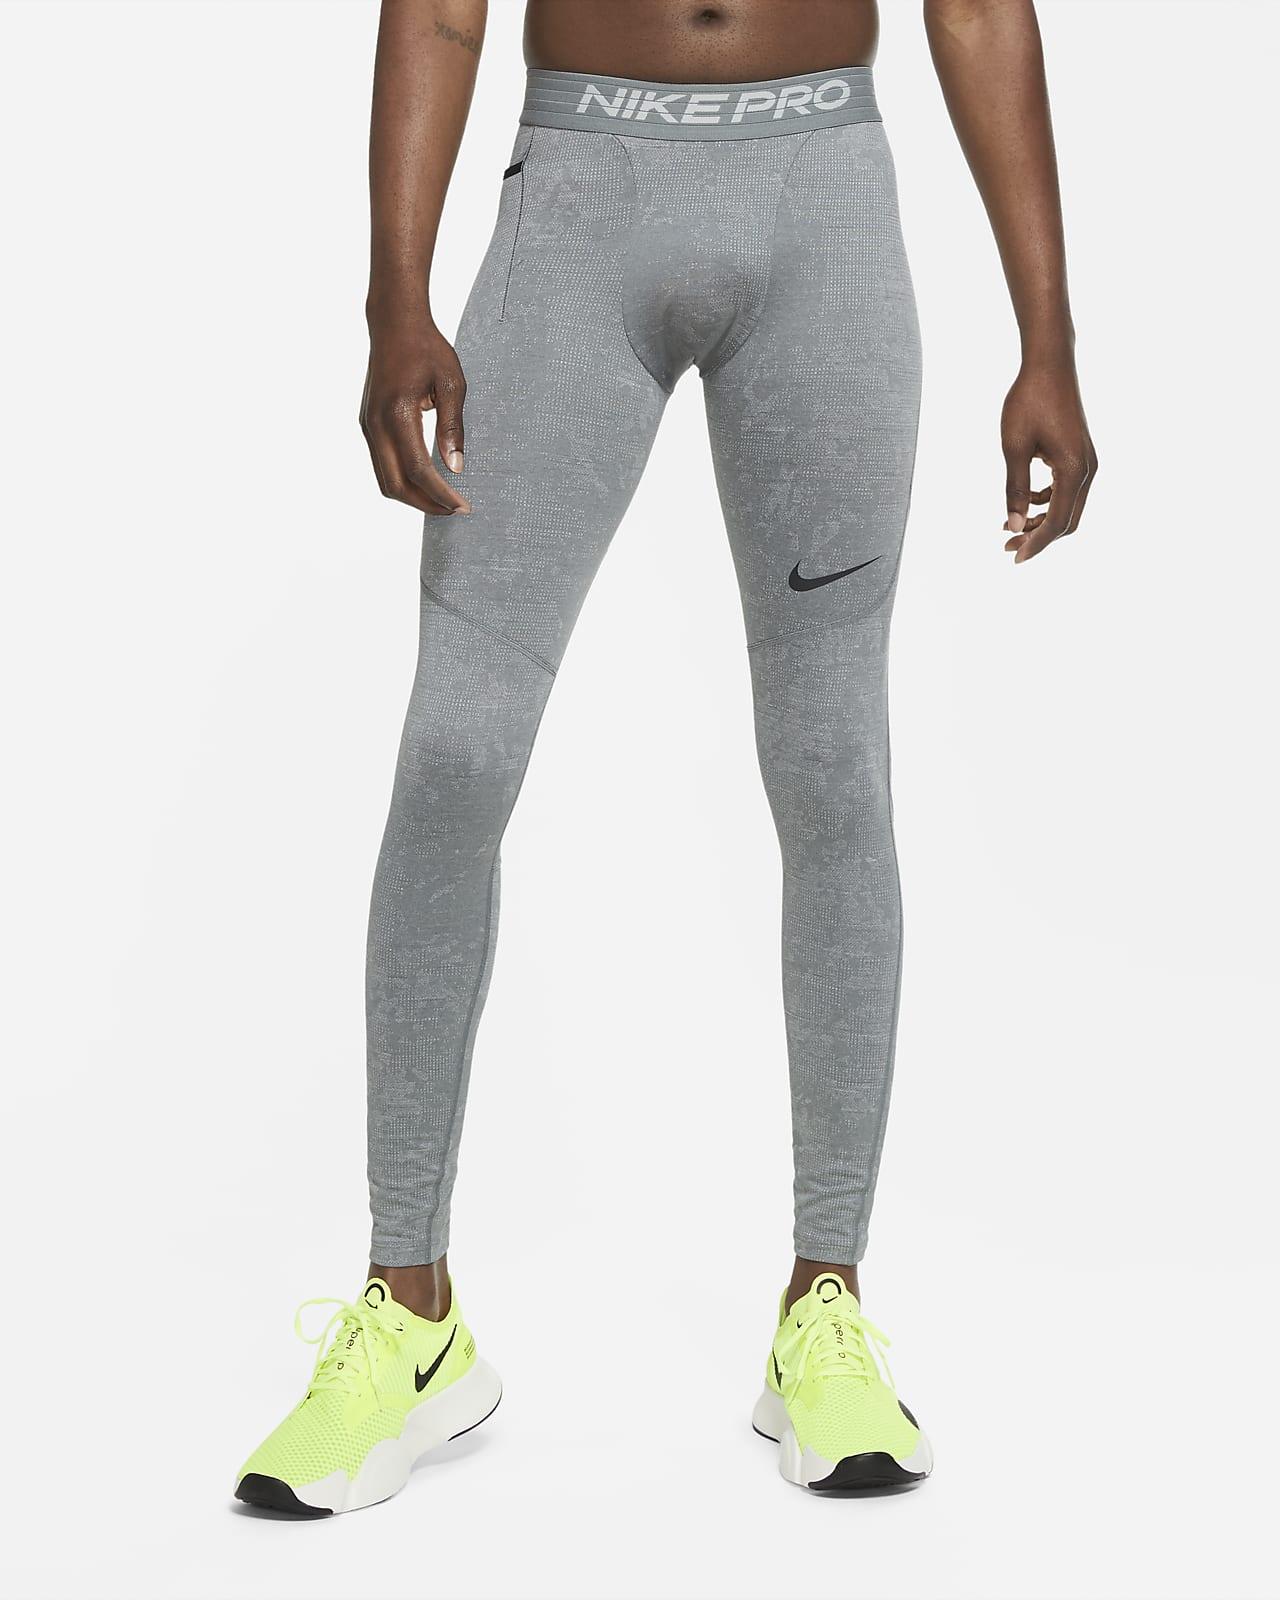 Męskie legginsy treningowe Nike